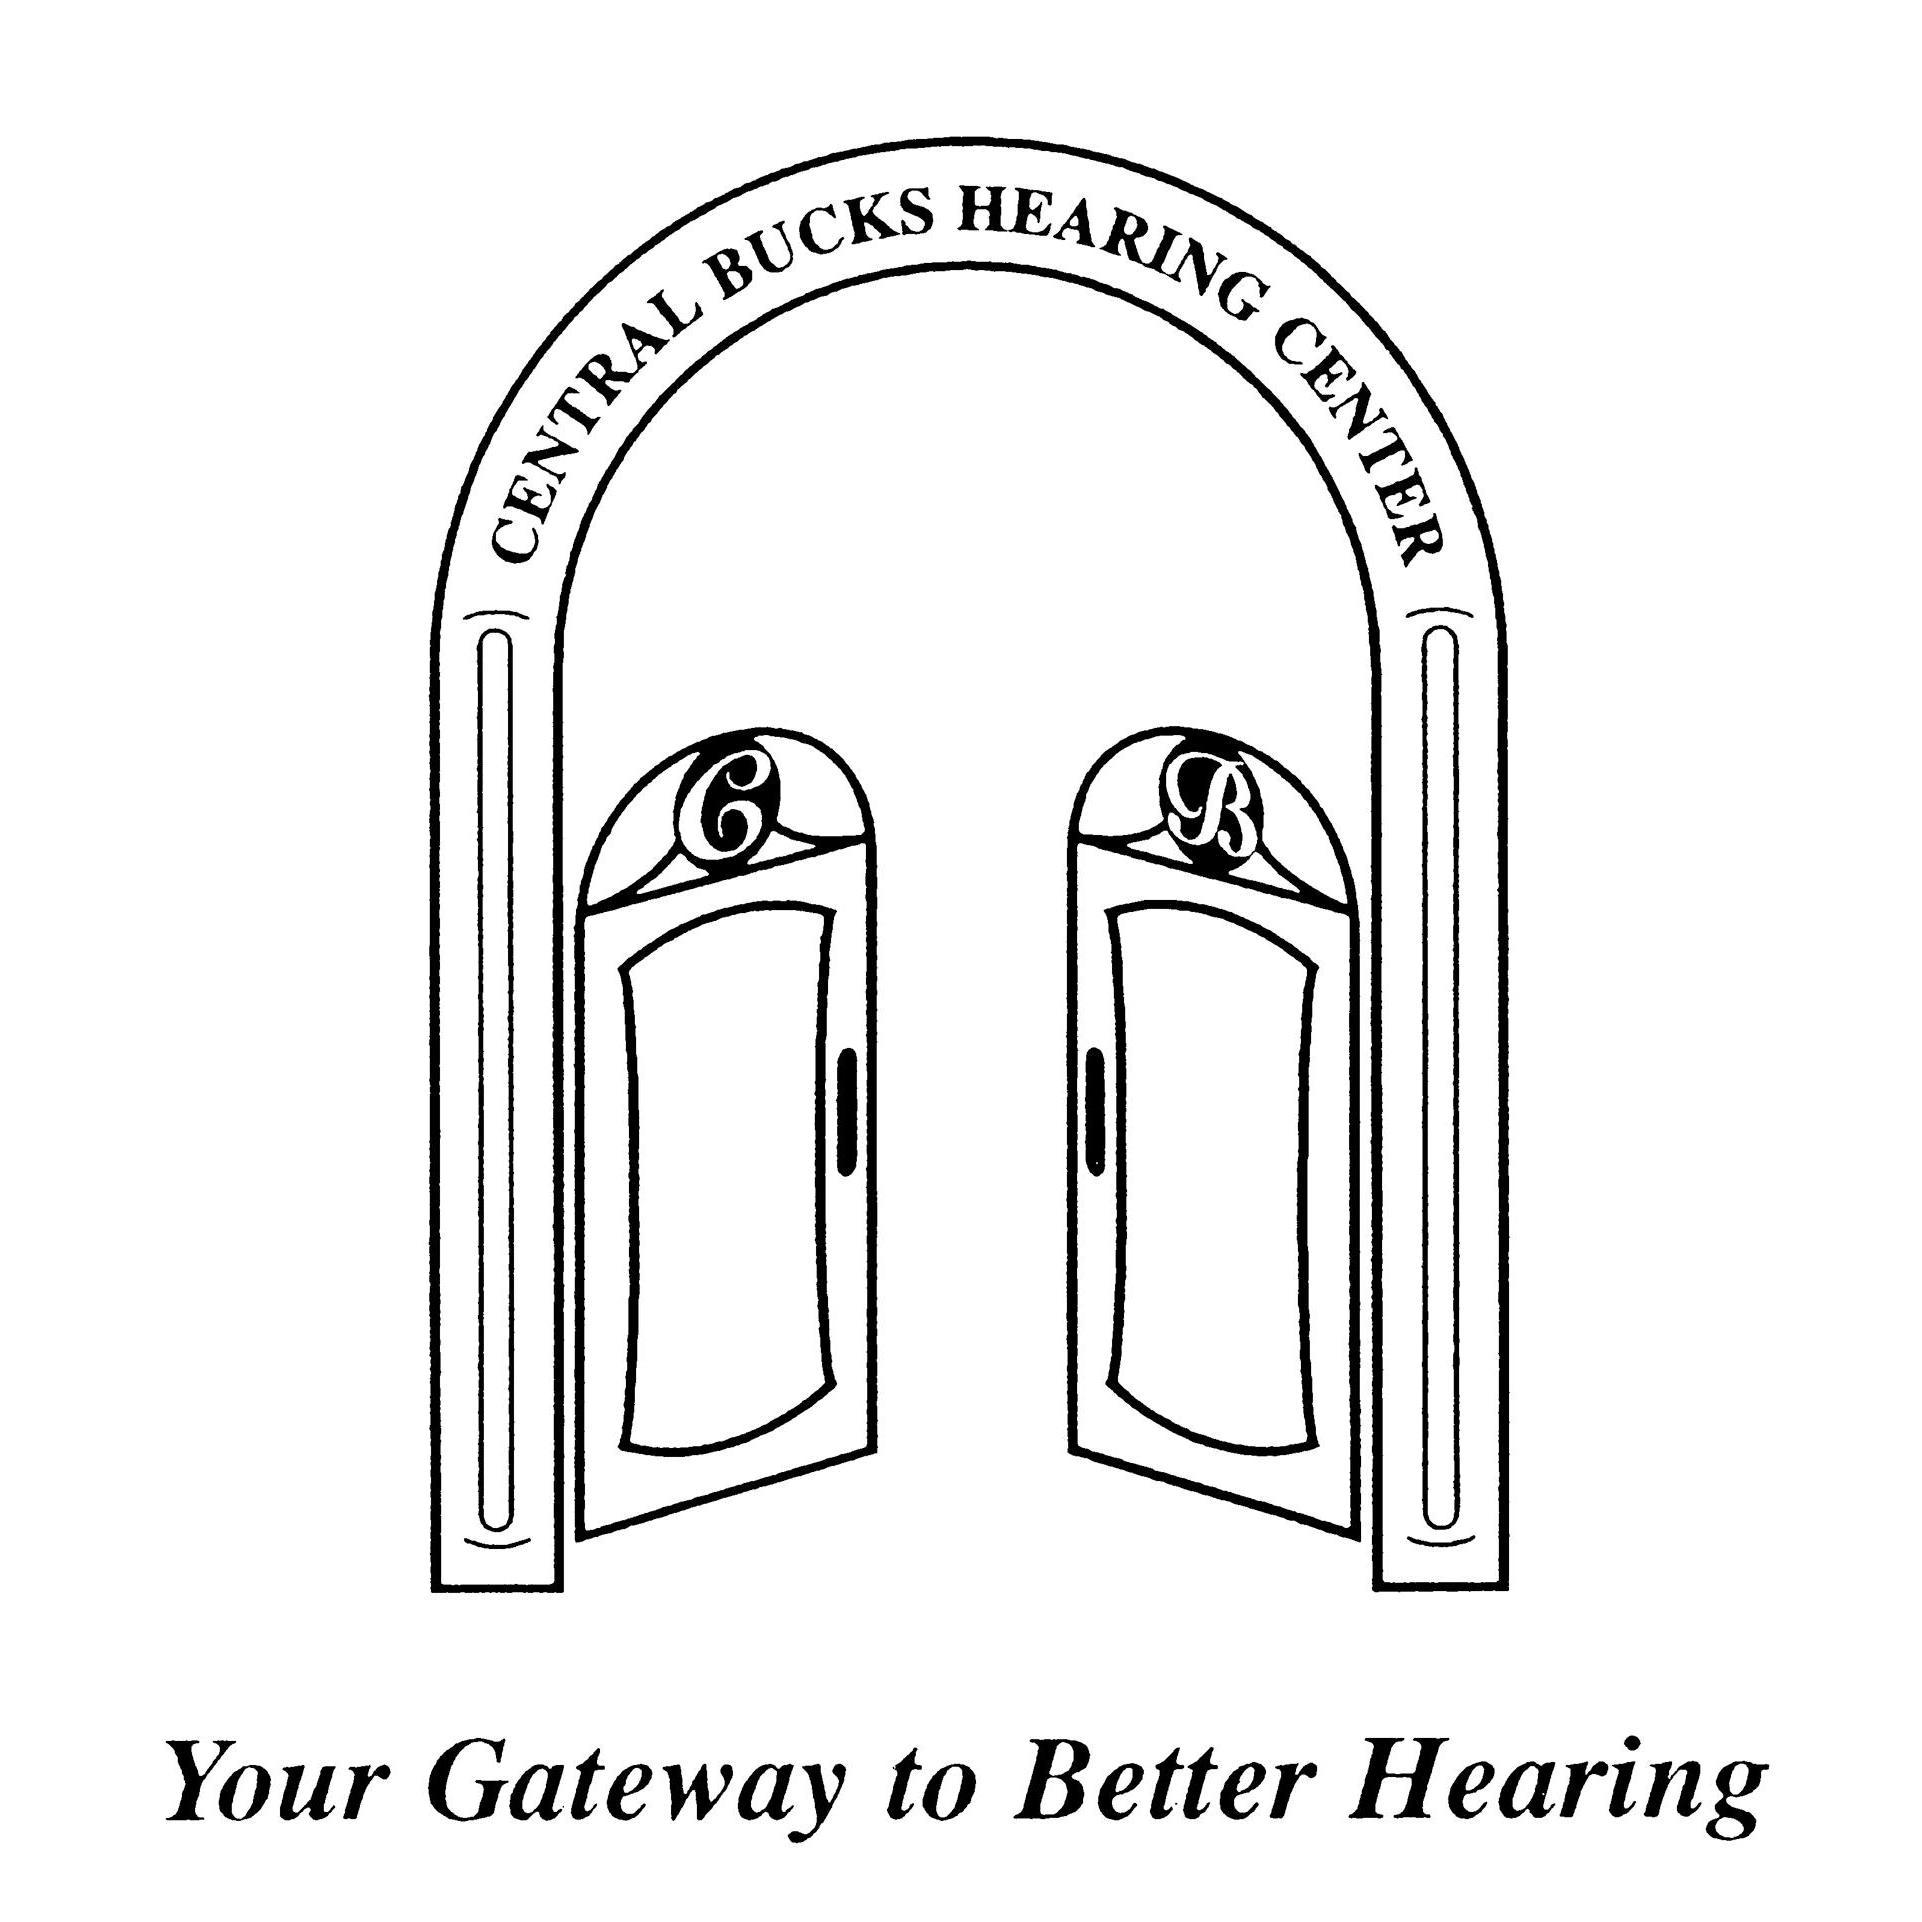 Central Bucks Hearing Center, P.C. - Fountainville, PA - Medical Supplies